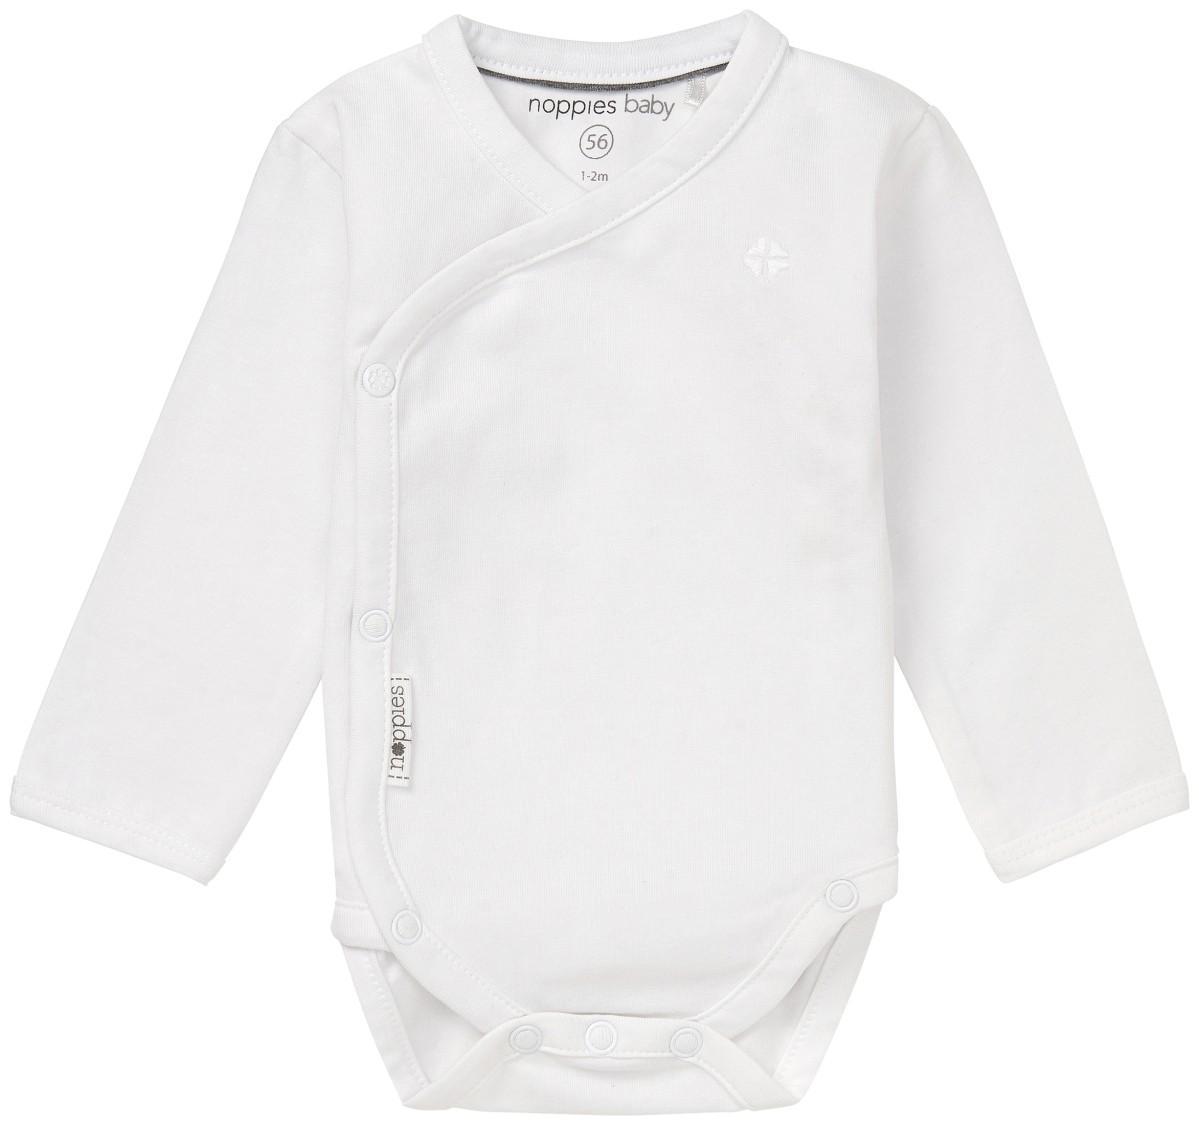 Noppies - Babypakje Ziara White - Prematuur